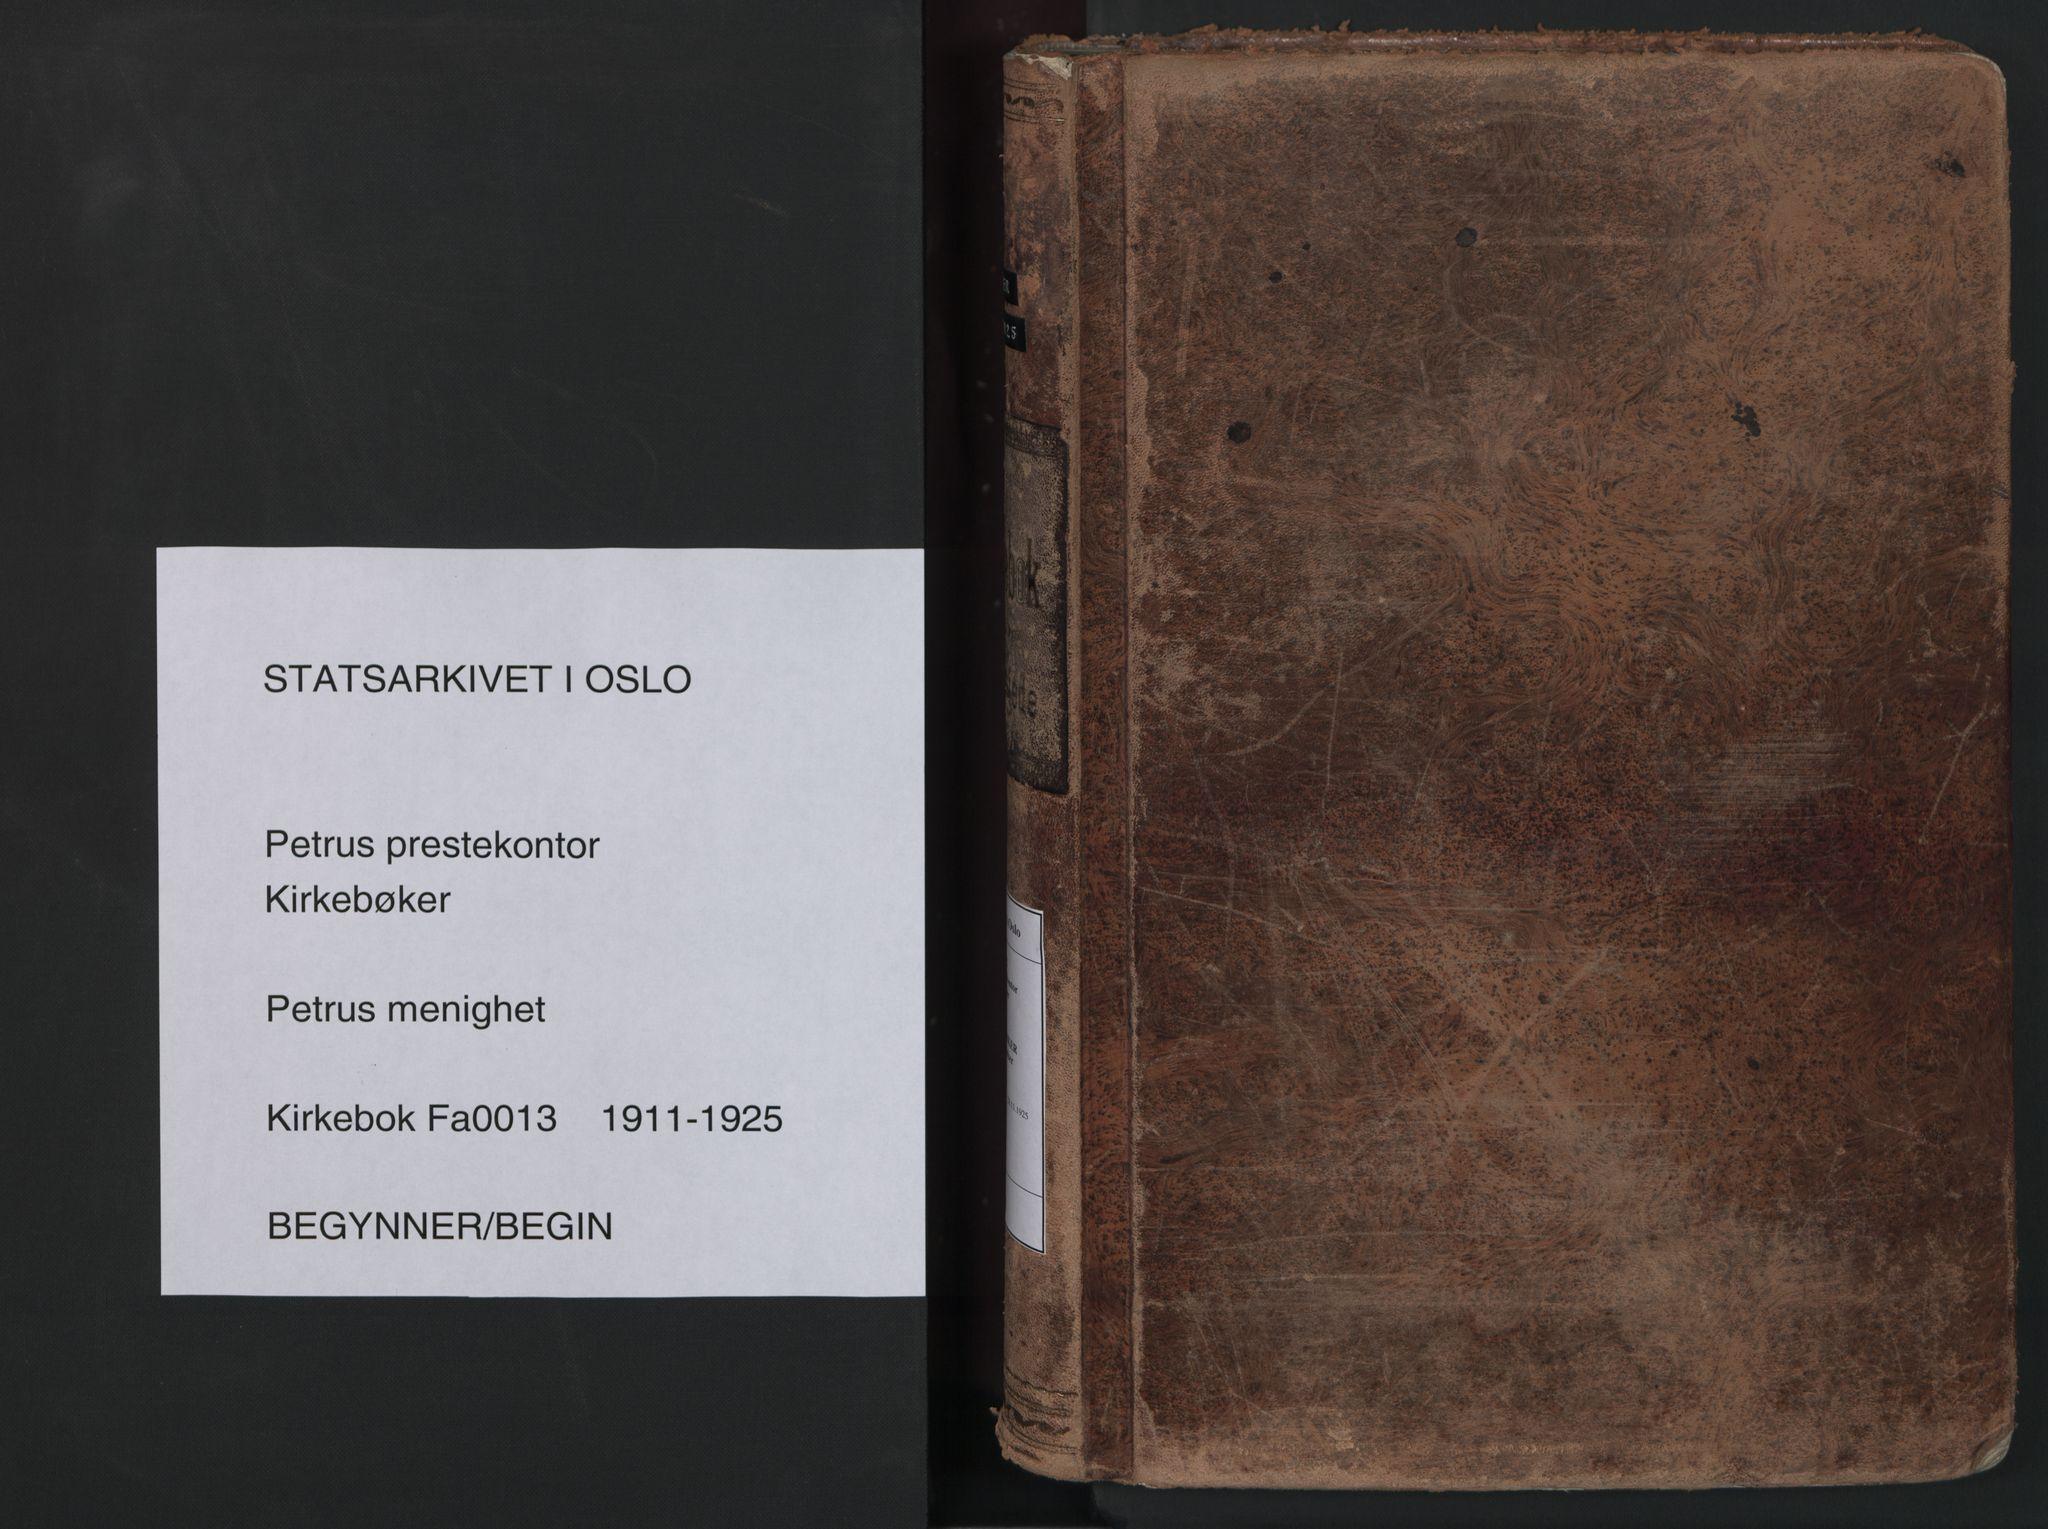 SAO, Petrus prestekontor Kirkebøker, F/Fa/L0013: Ministerialbok nr. 13, 1911-1925